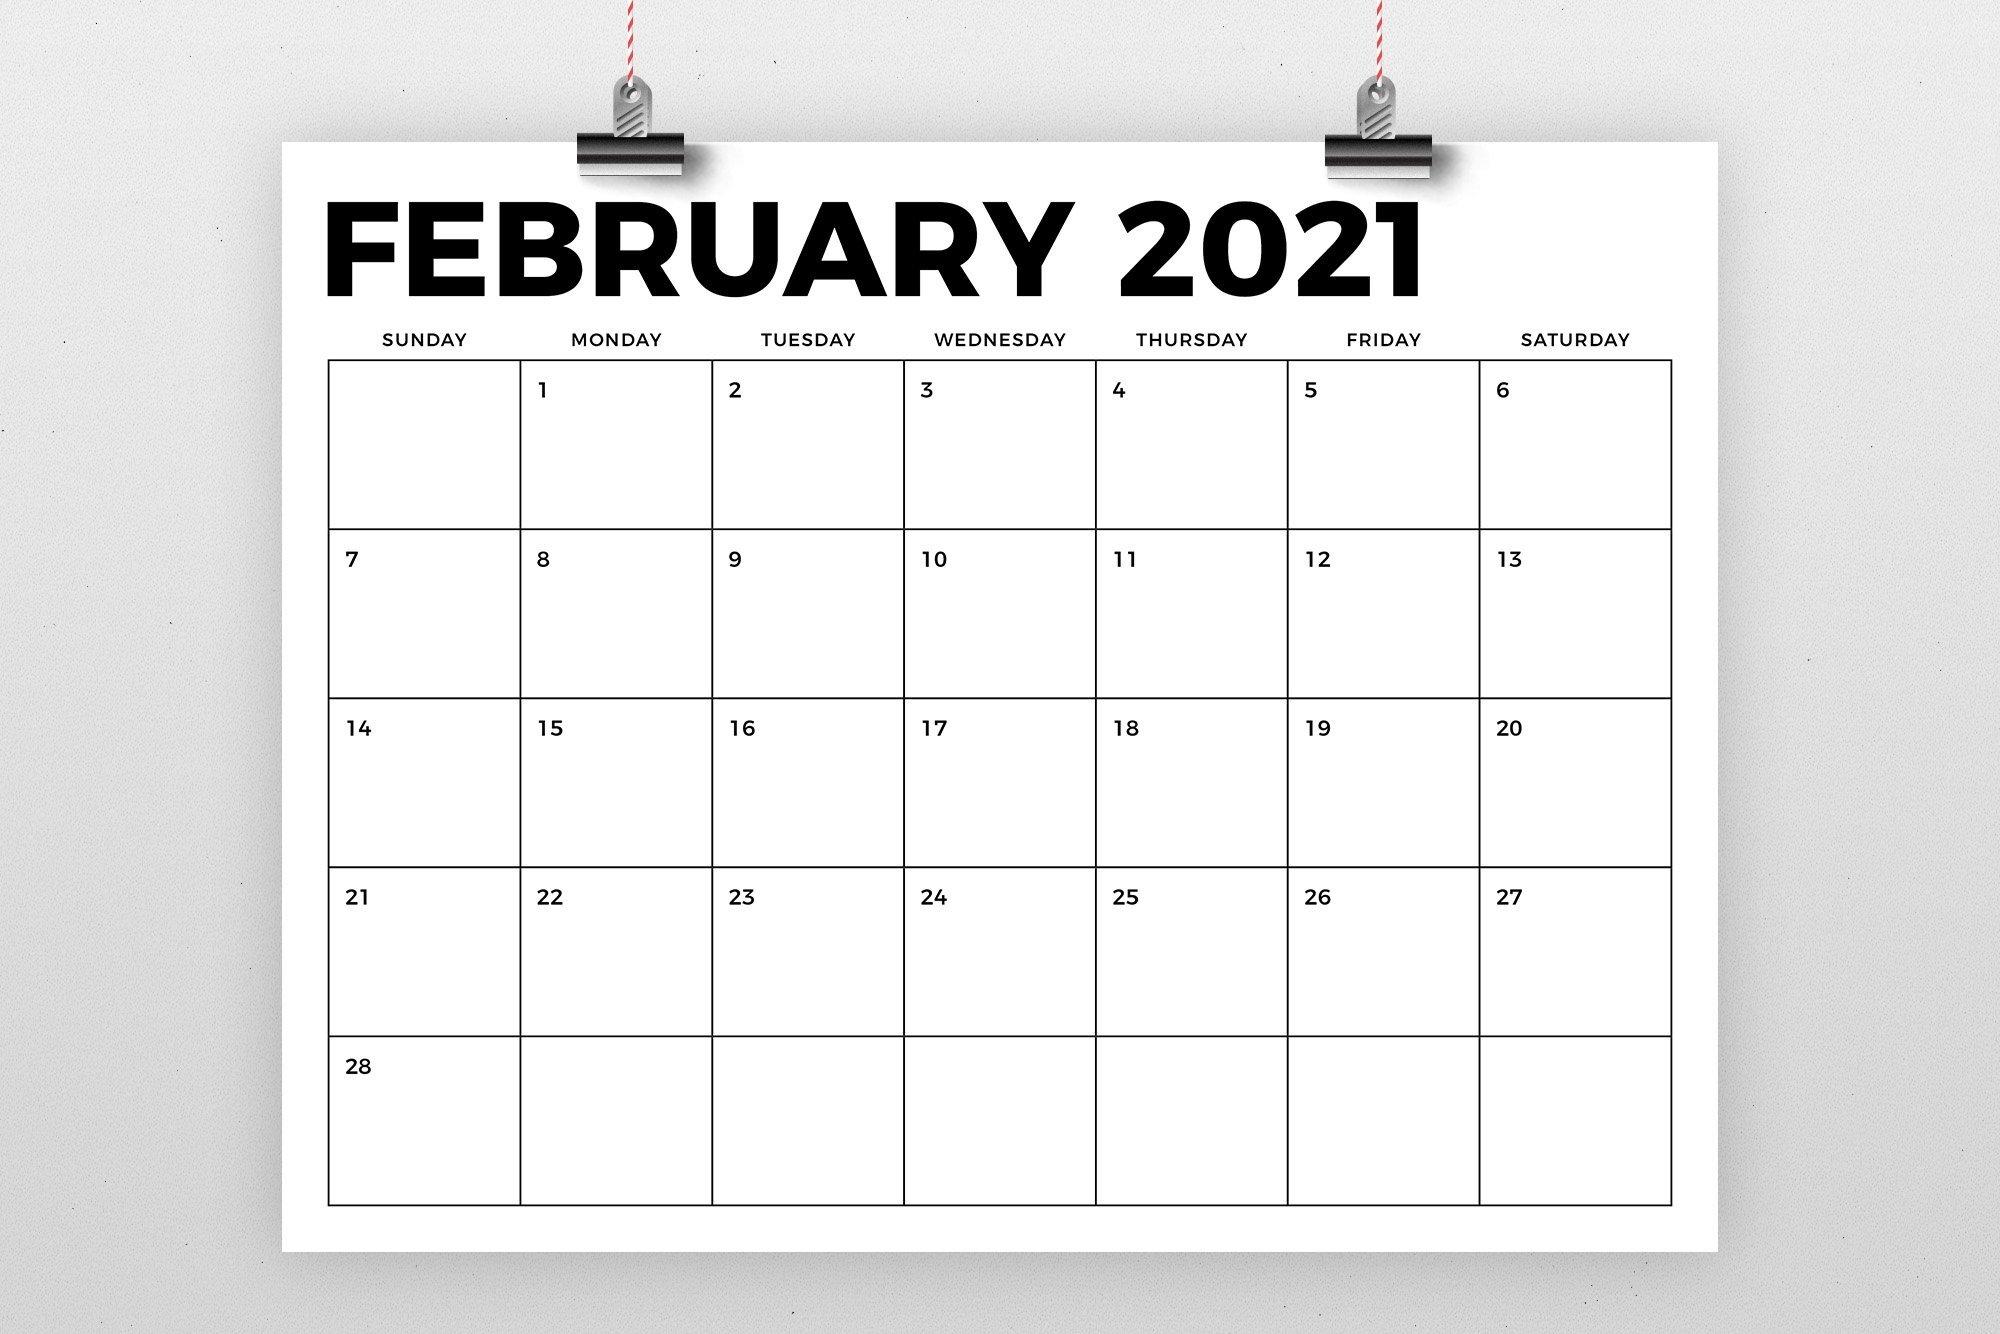 8.5 X 11 Inch Bold 2021 Calendar (438443)   Flyers   Design Bundles throughout 2021 Calendars With Lines